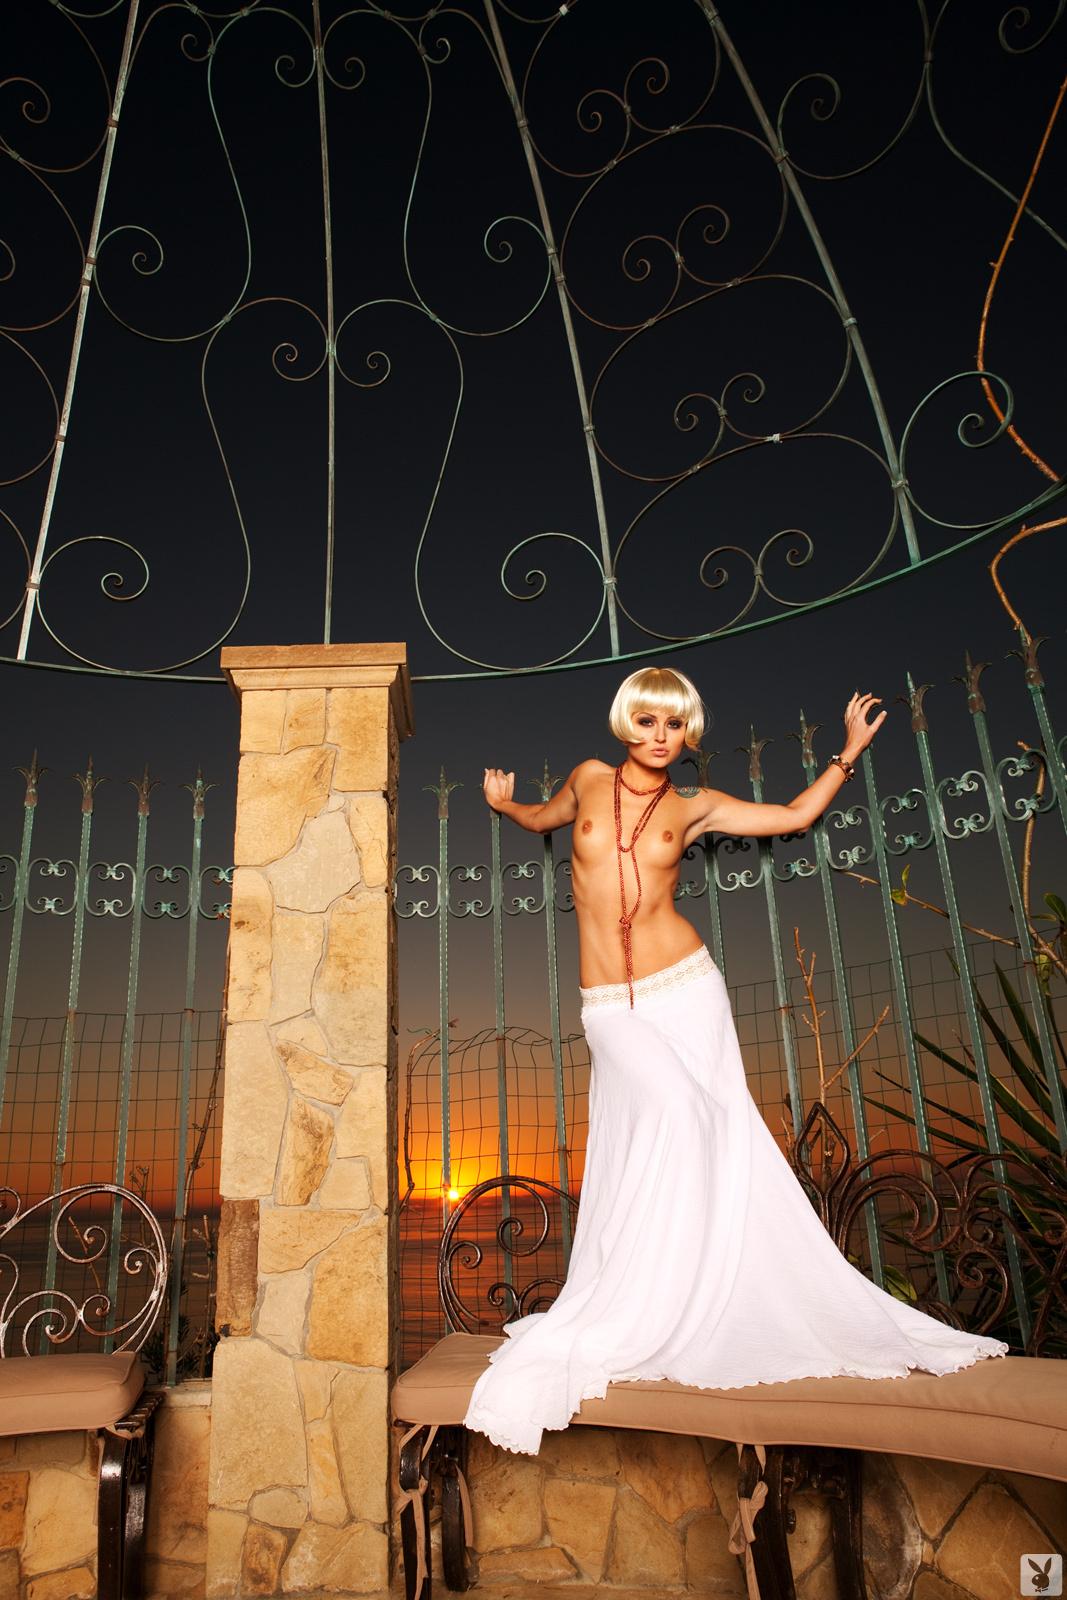 veronica-lavery-blonde-naked-playboy-02